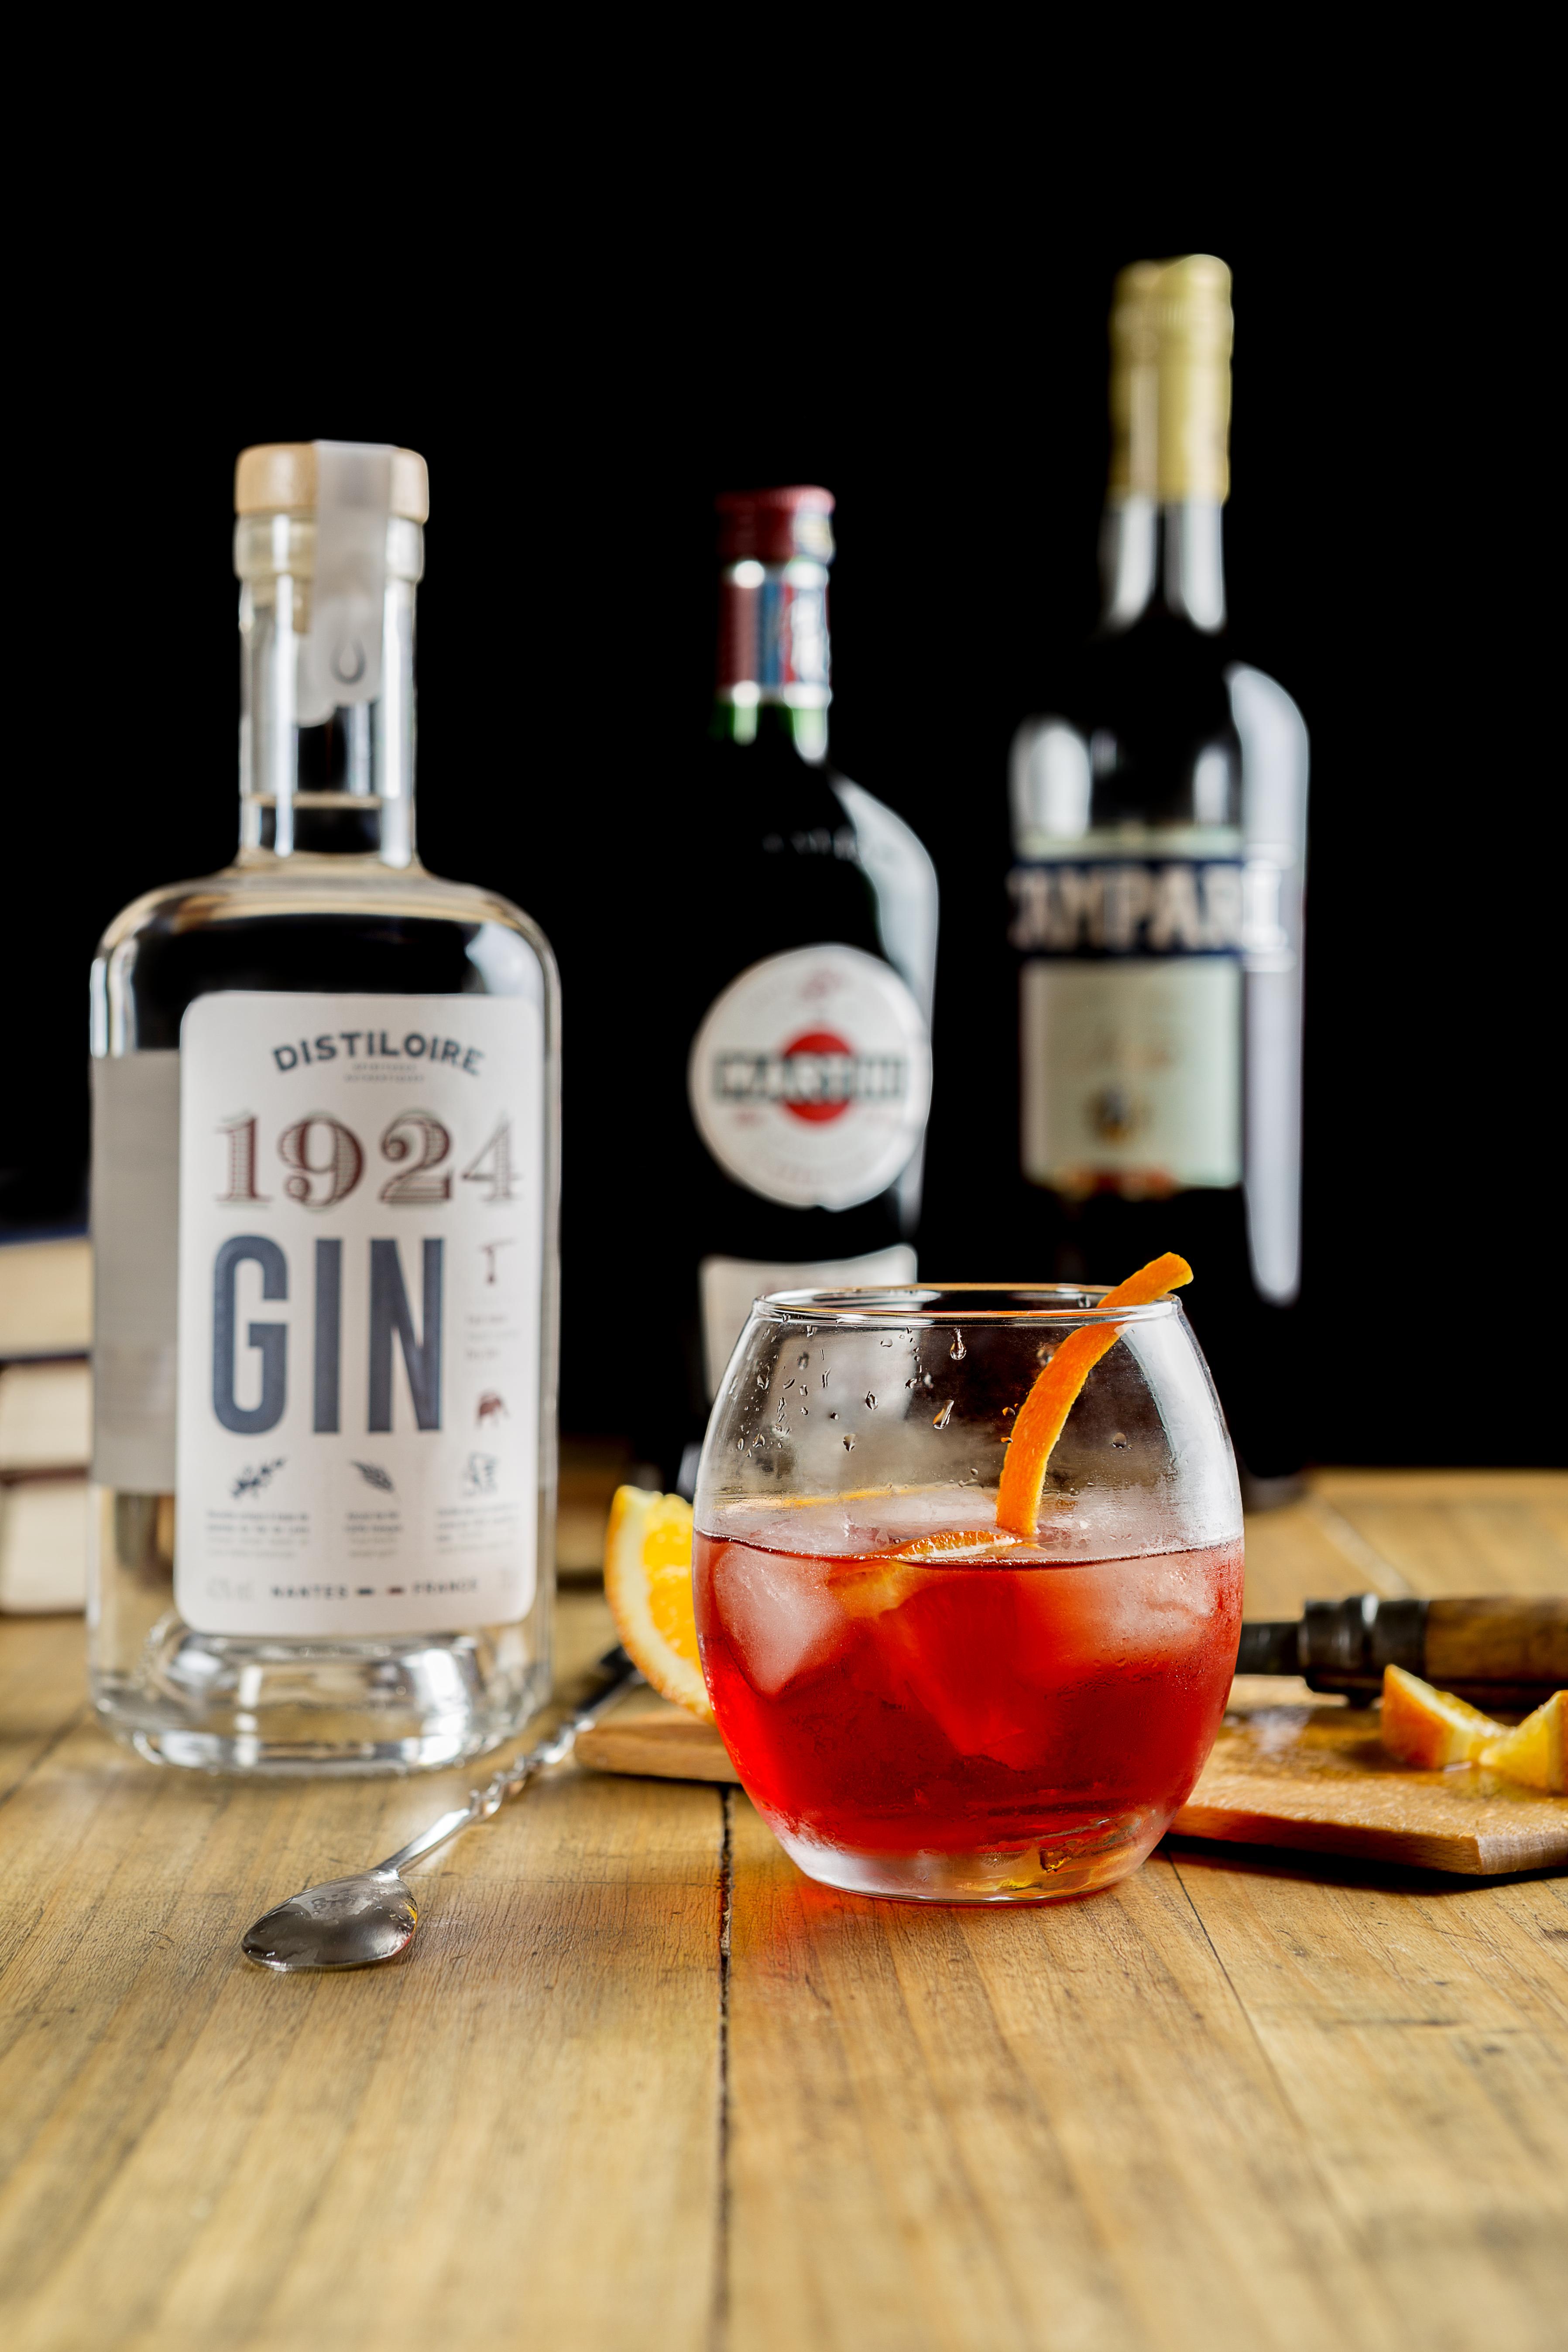 Negroni - Gin 1924 Distiloire